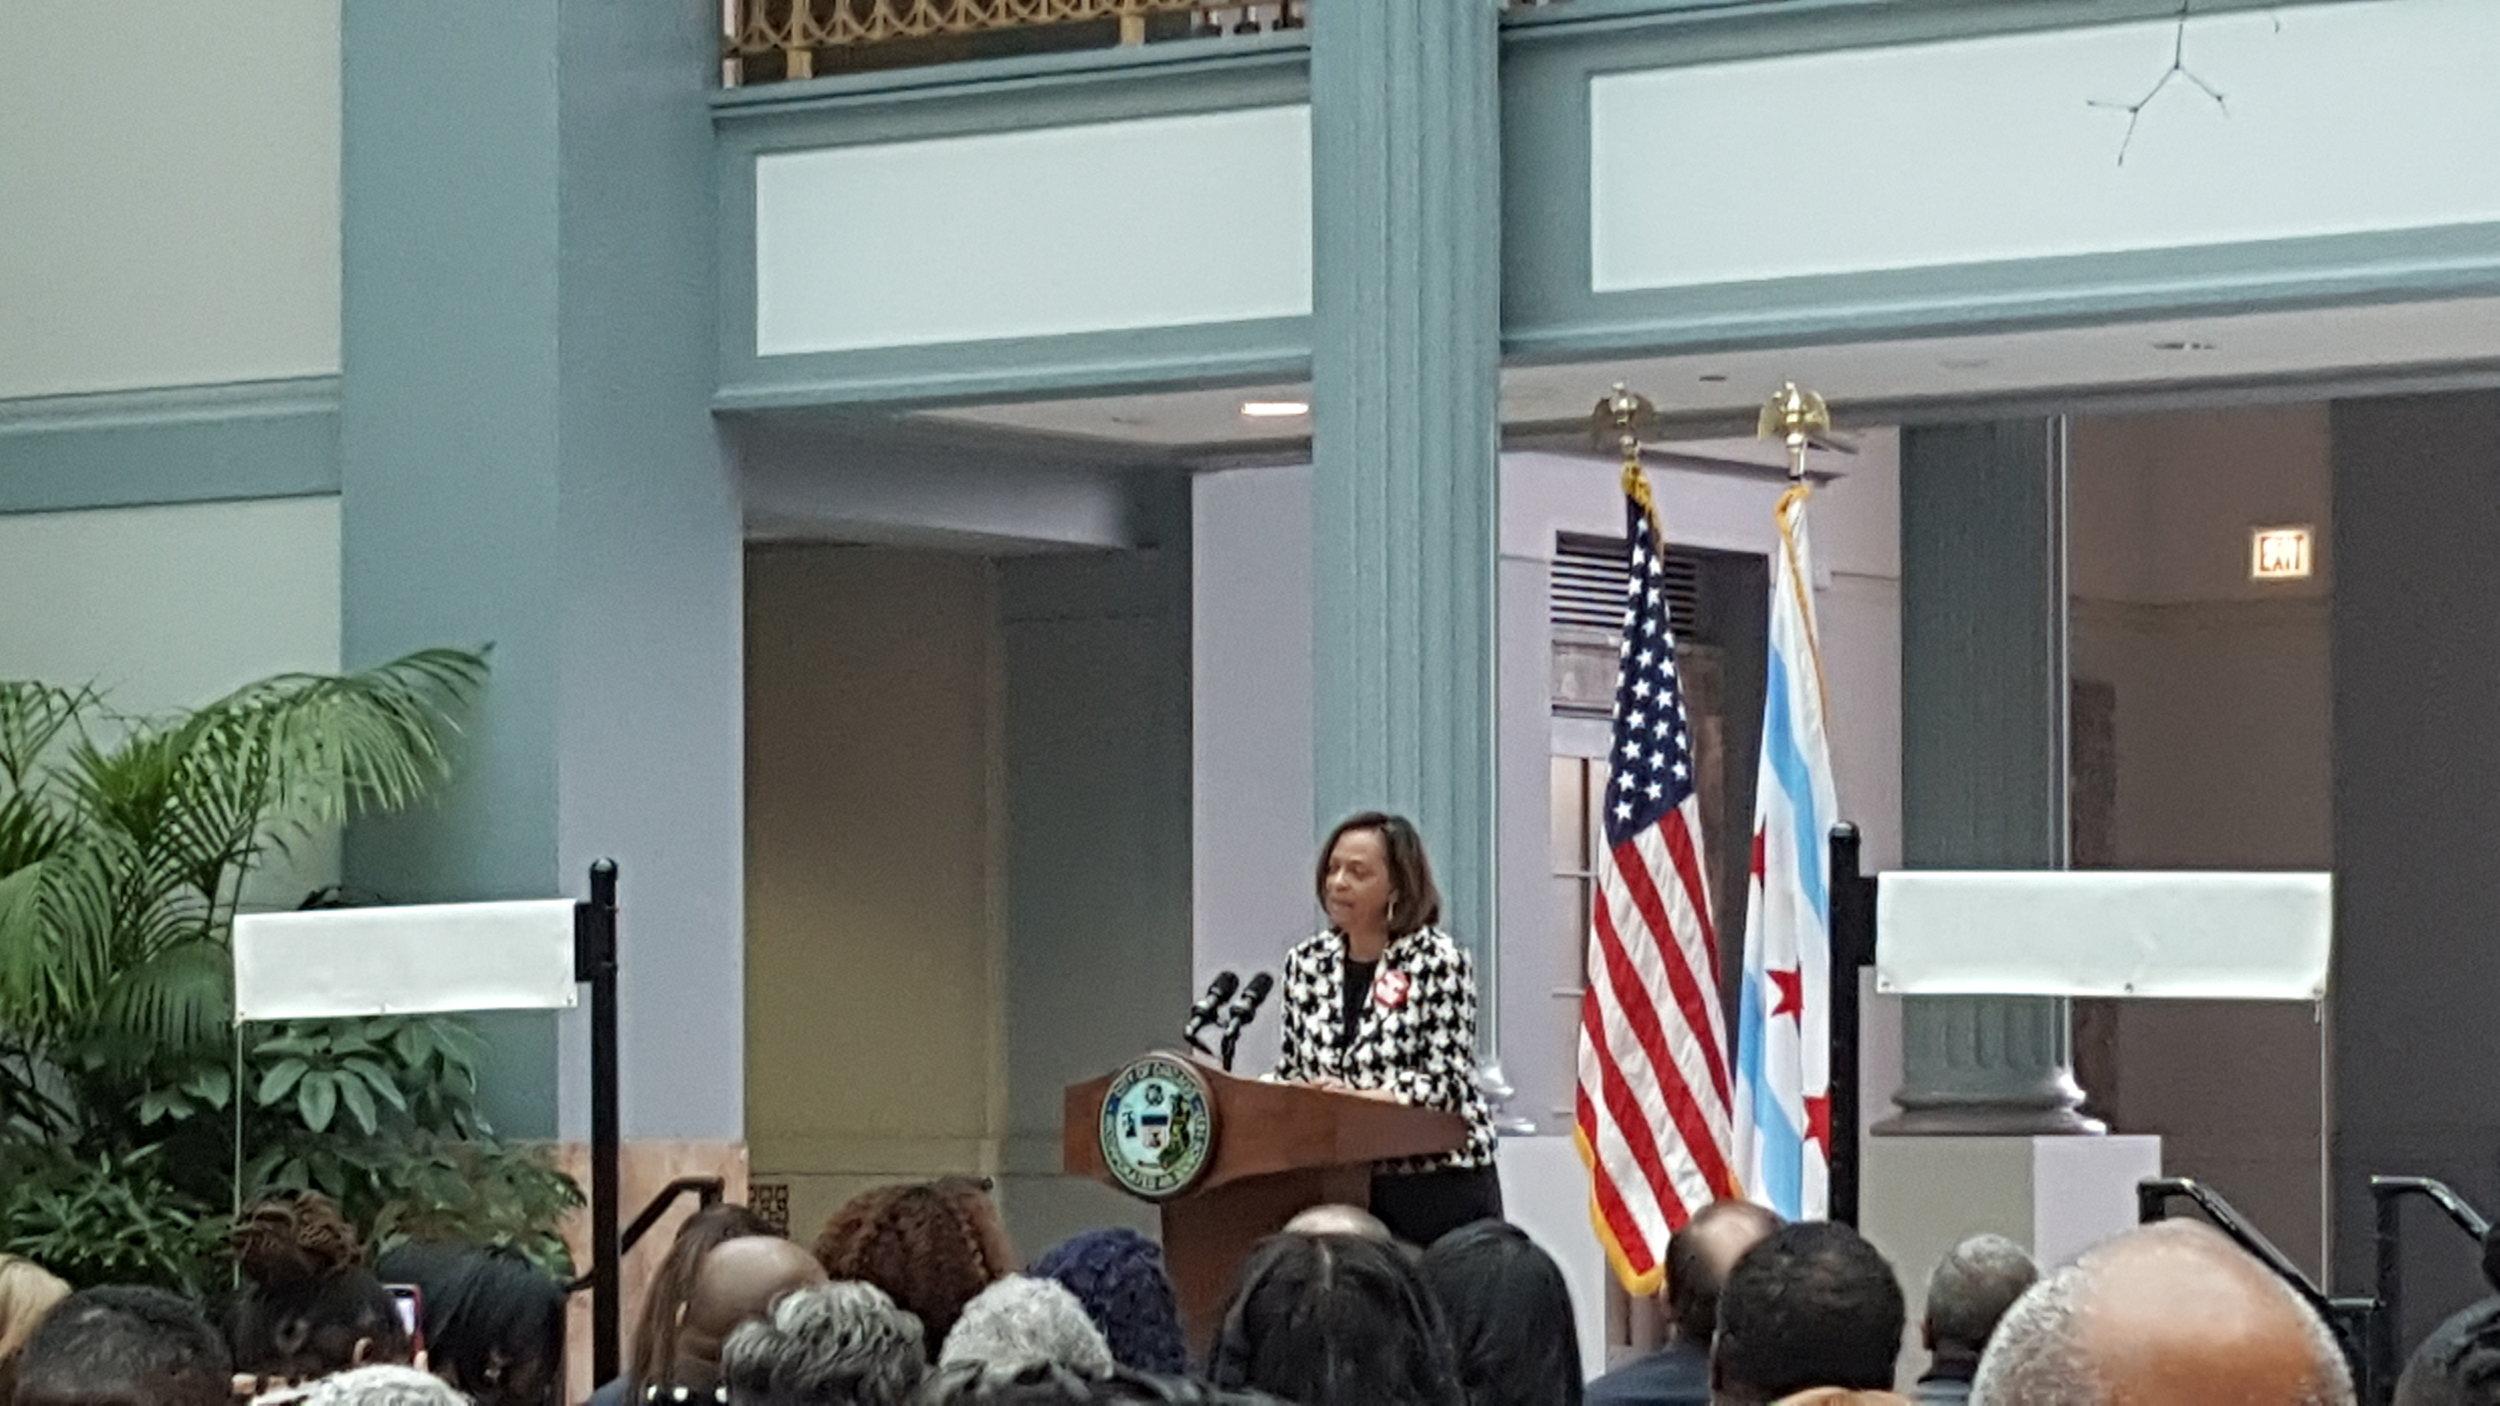 20190211_LOWV Claire Hartfield_ida b wells unveiling_honorary chicago.jpg